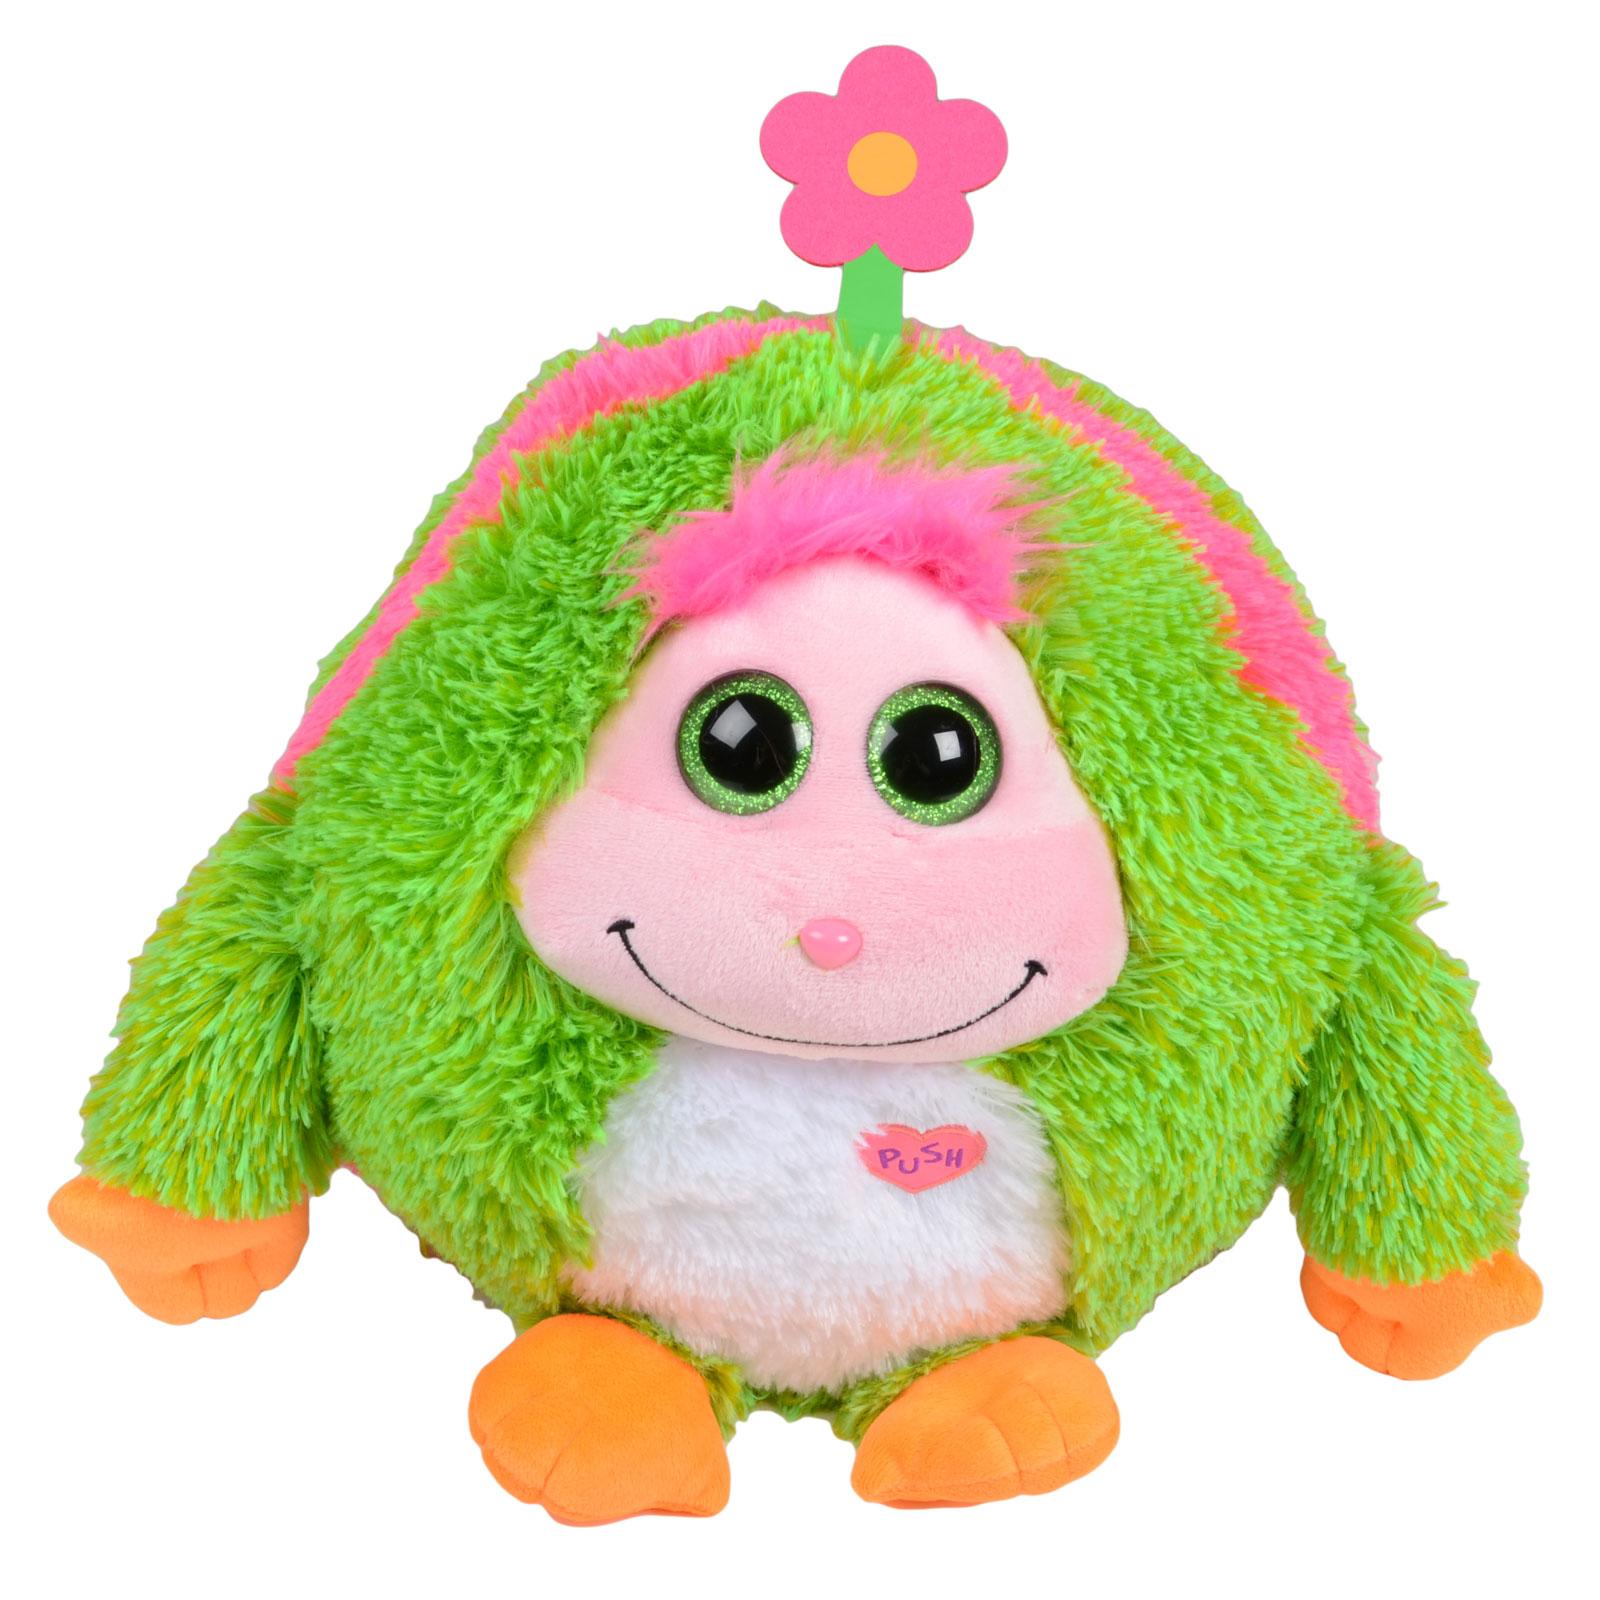 Soft Plush Toys : Childrens quot monstaz plush soft toy talking monsters